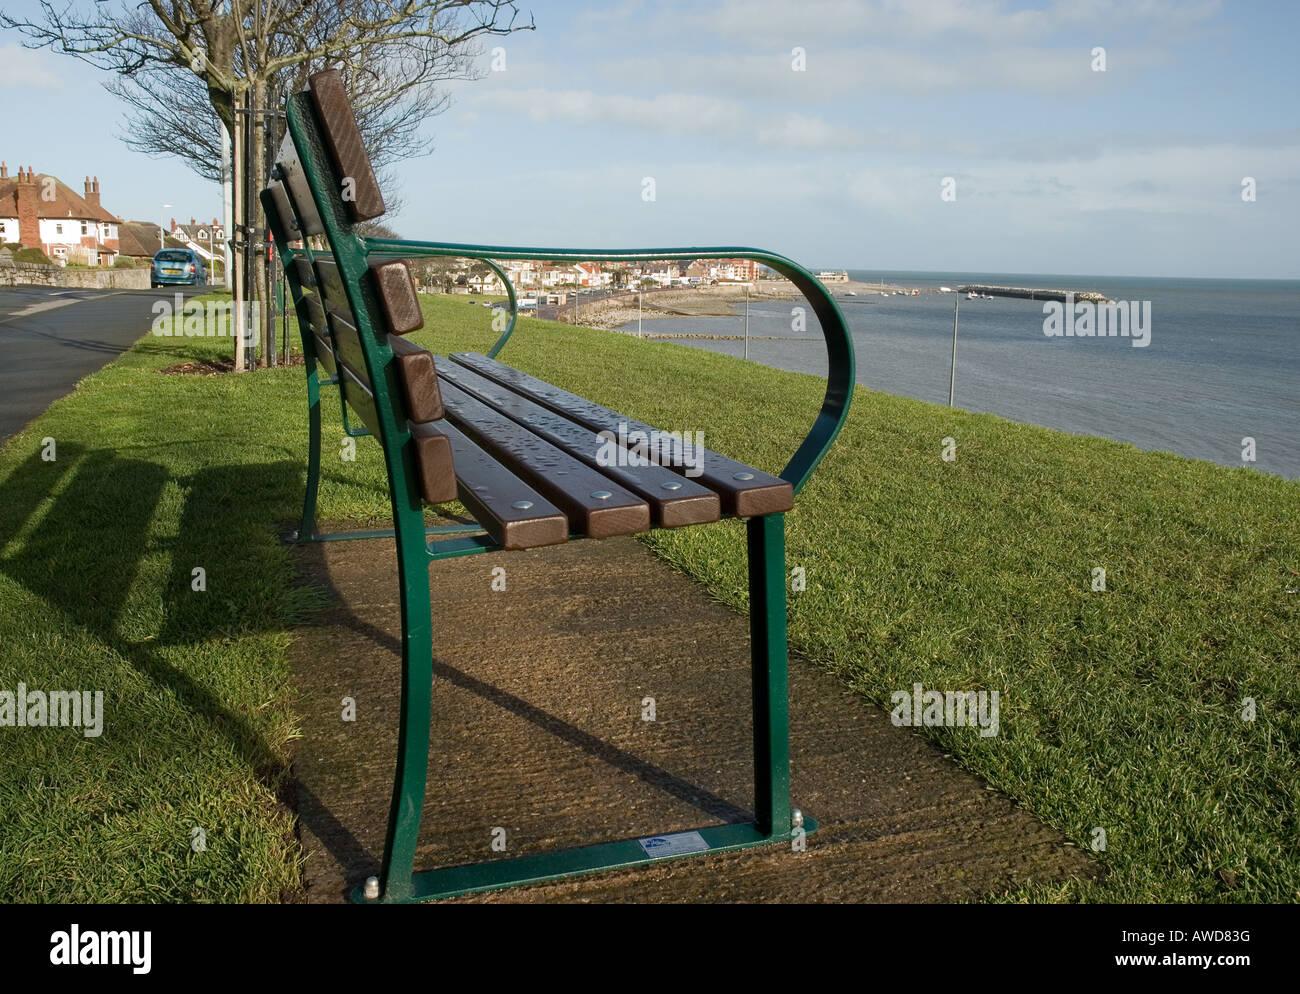 Park bench overlooking Colwyn Bay Promenade - Stock Image